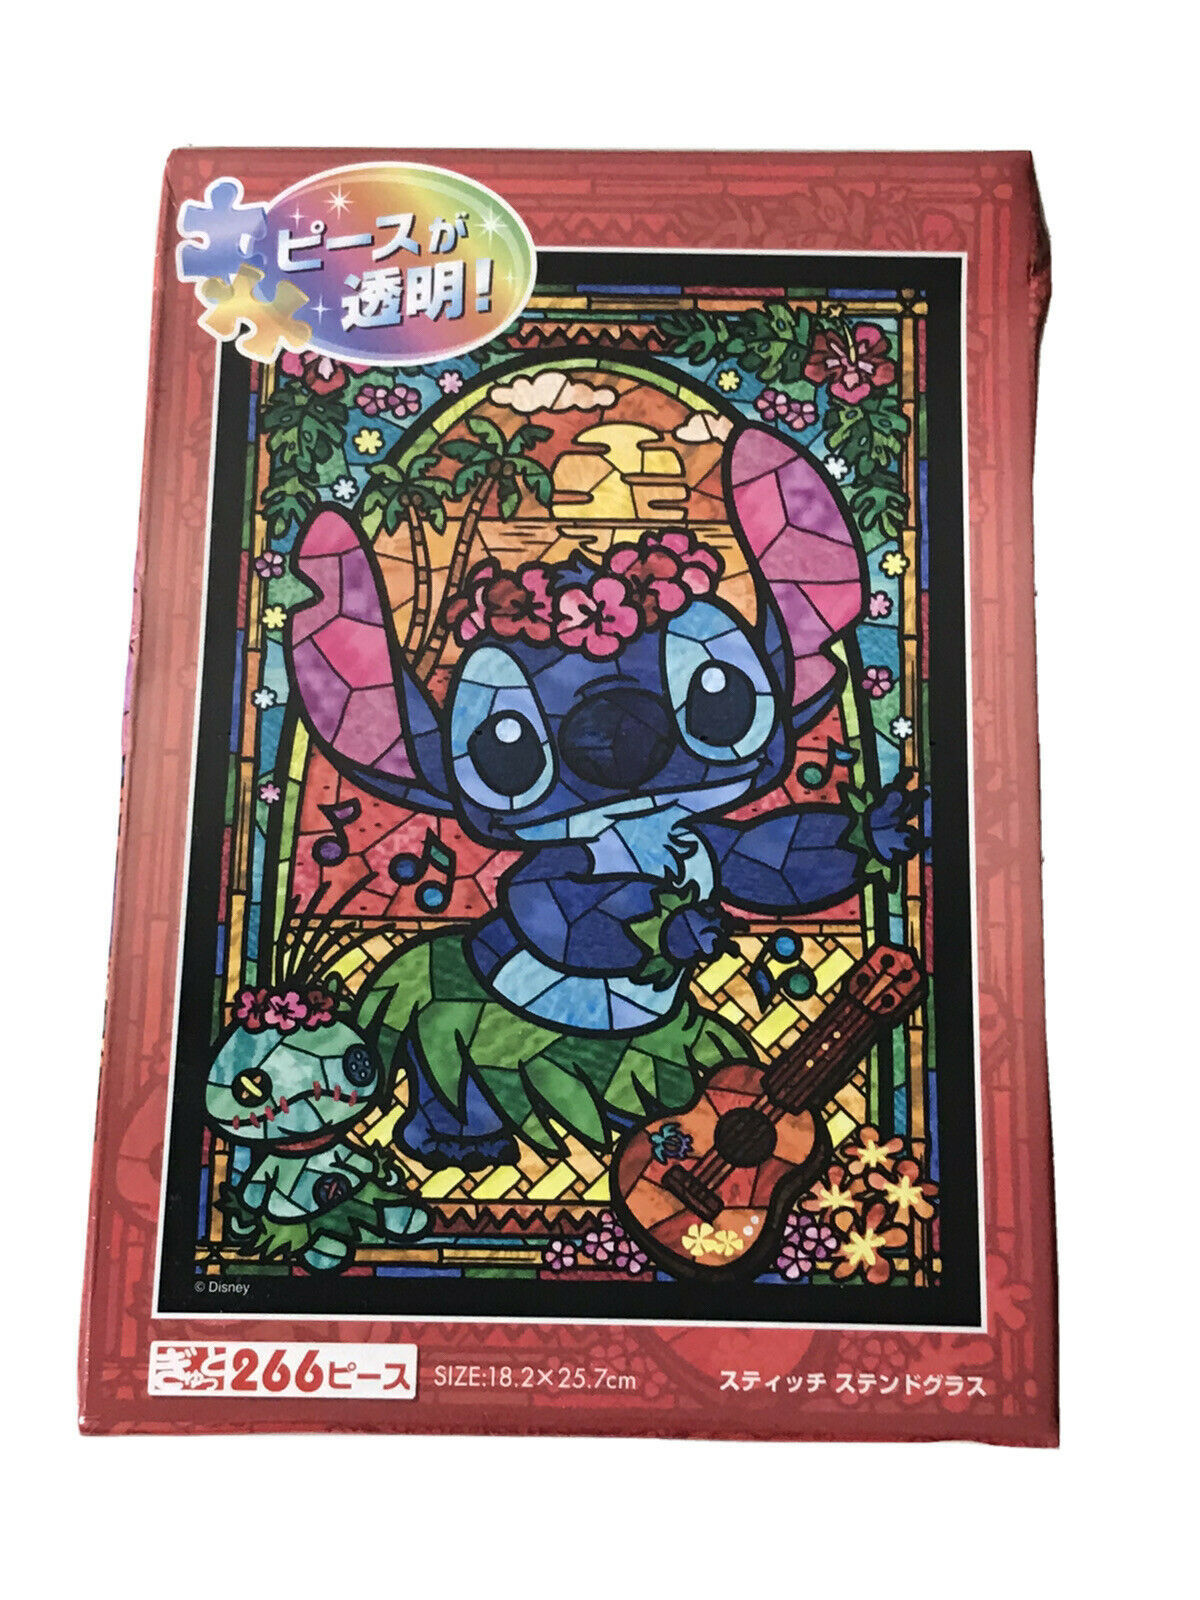 266 piece jigsaw puzzle Stained Art Stitch! stained glass (18.2x25.7cm) New - $49.49